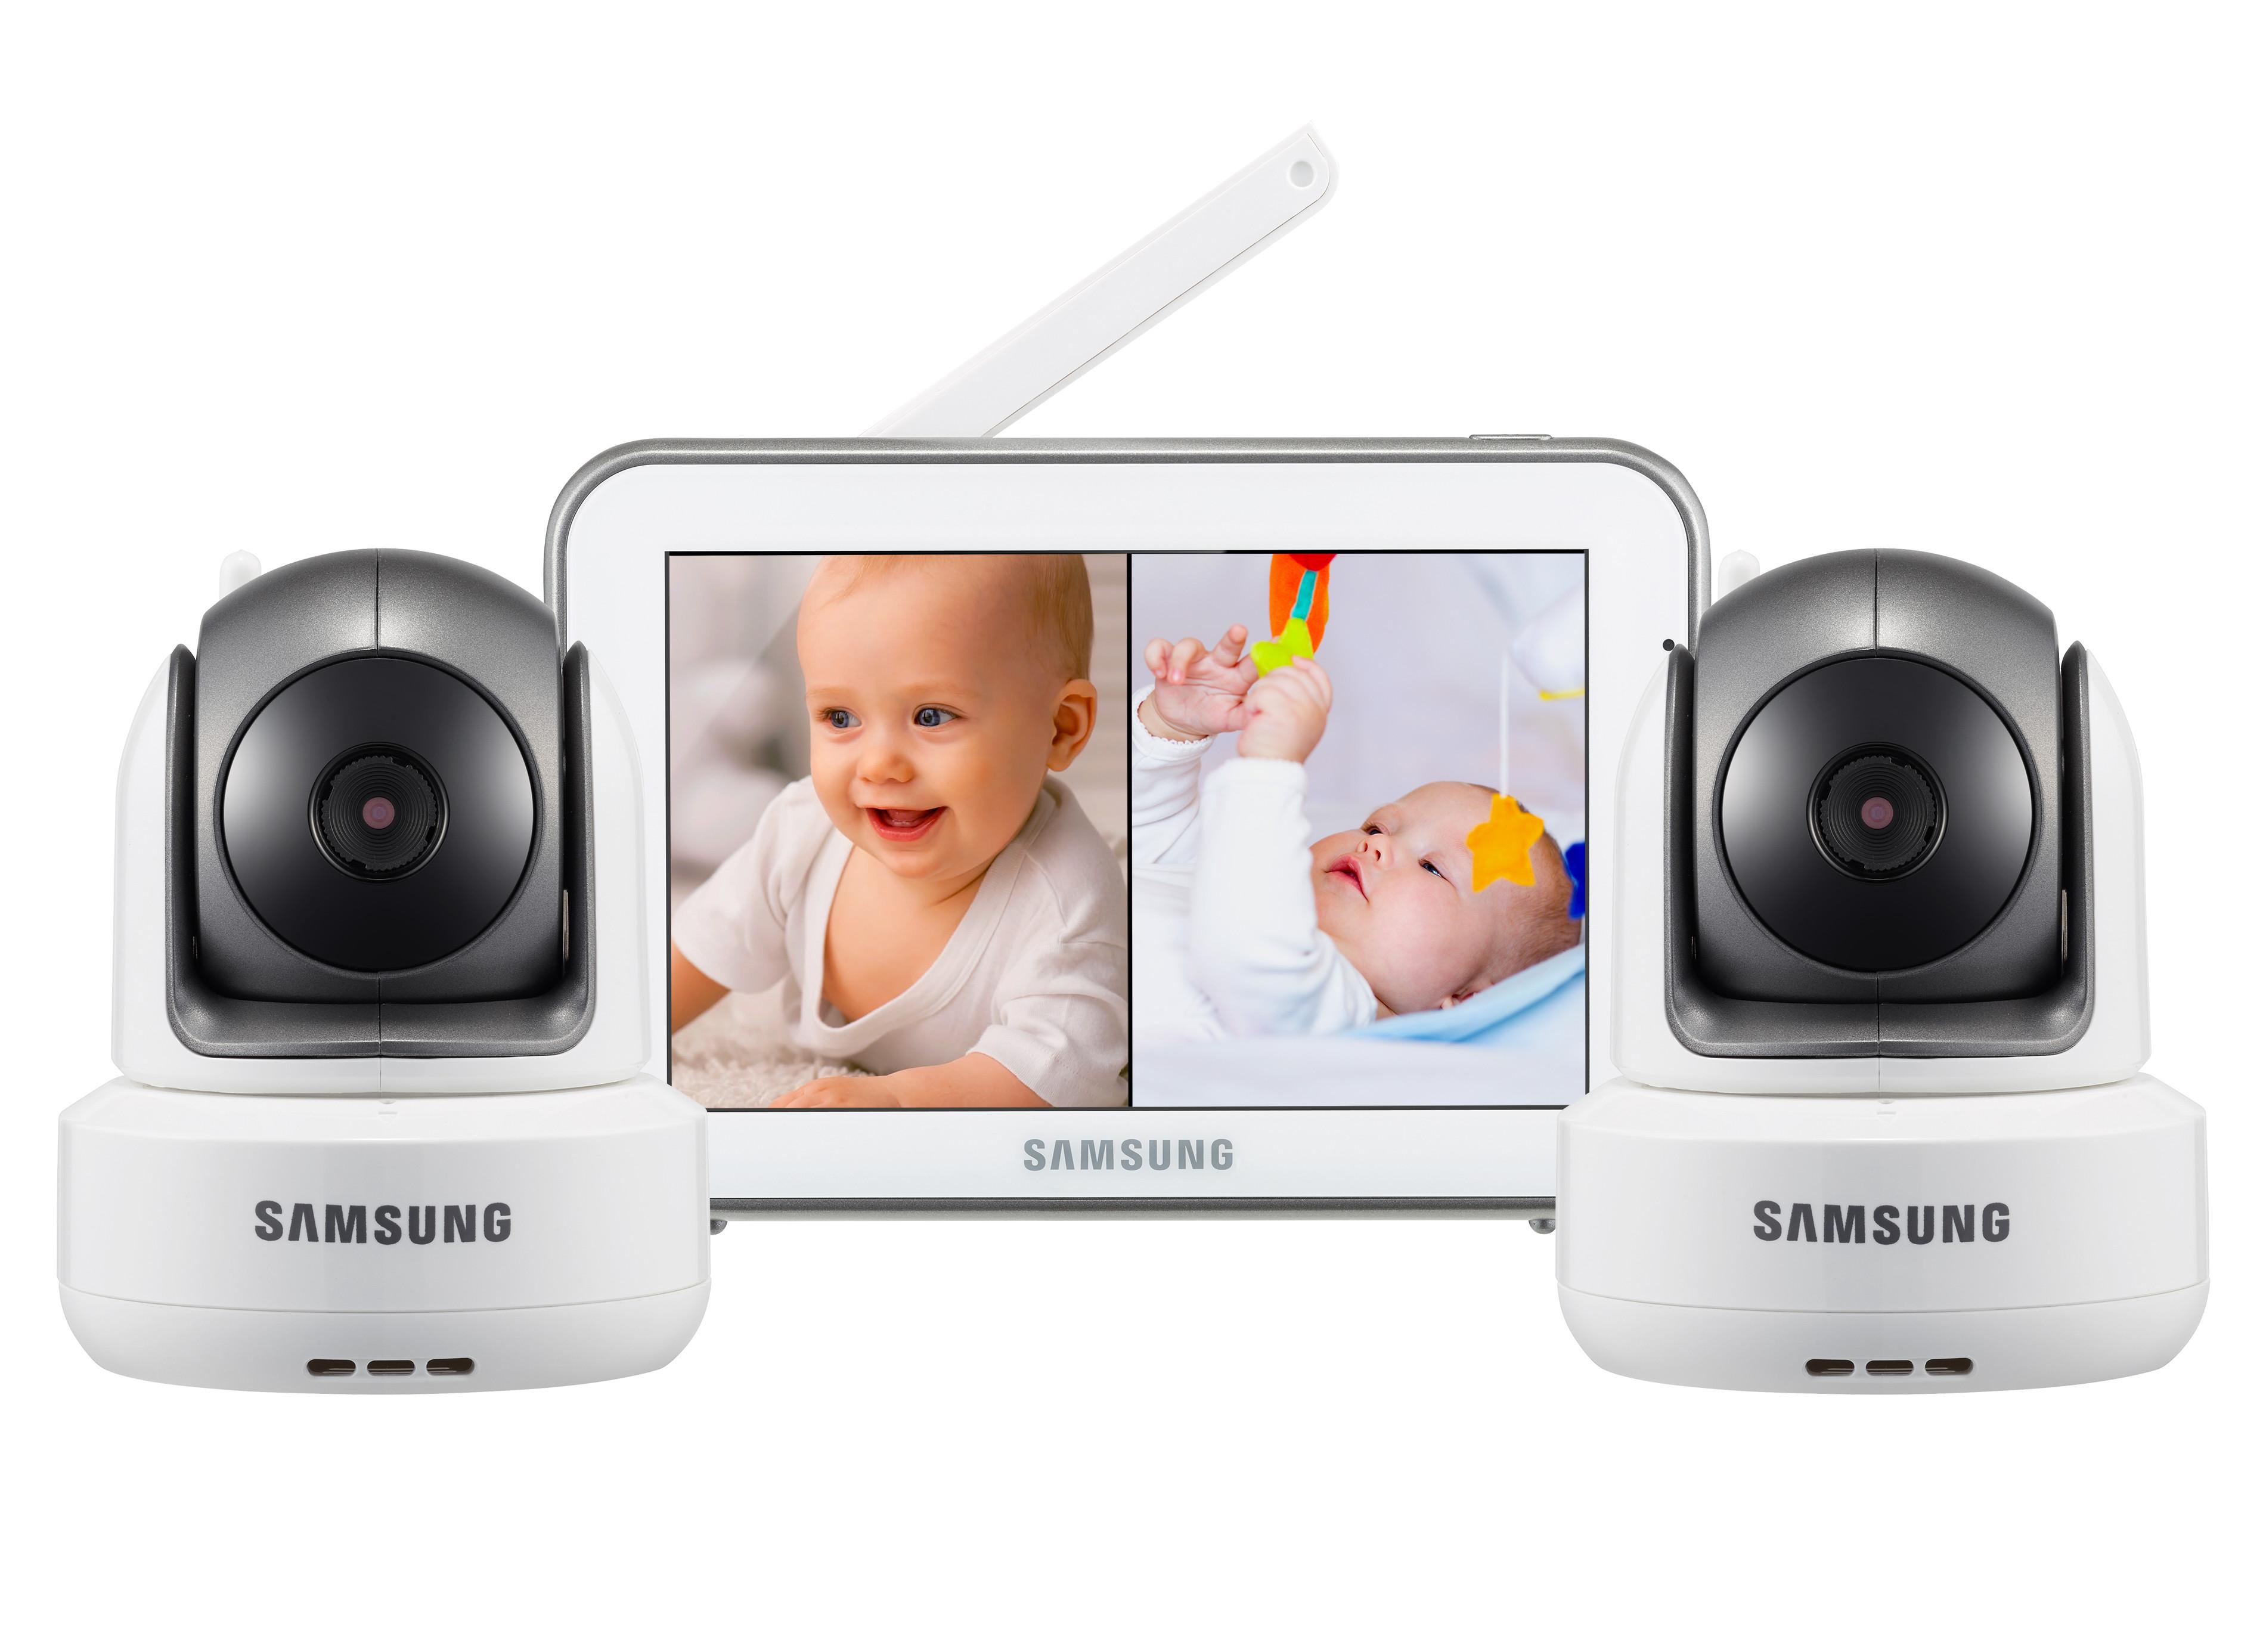 Радио и видеоняни Samsung Видеоняня Samsung SEW-3043WPX2